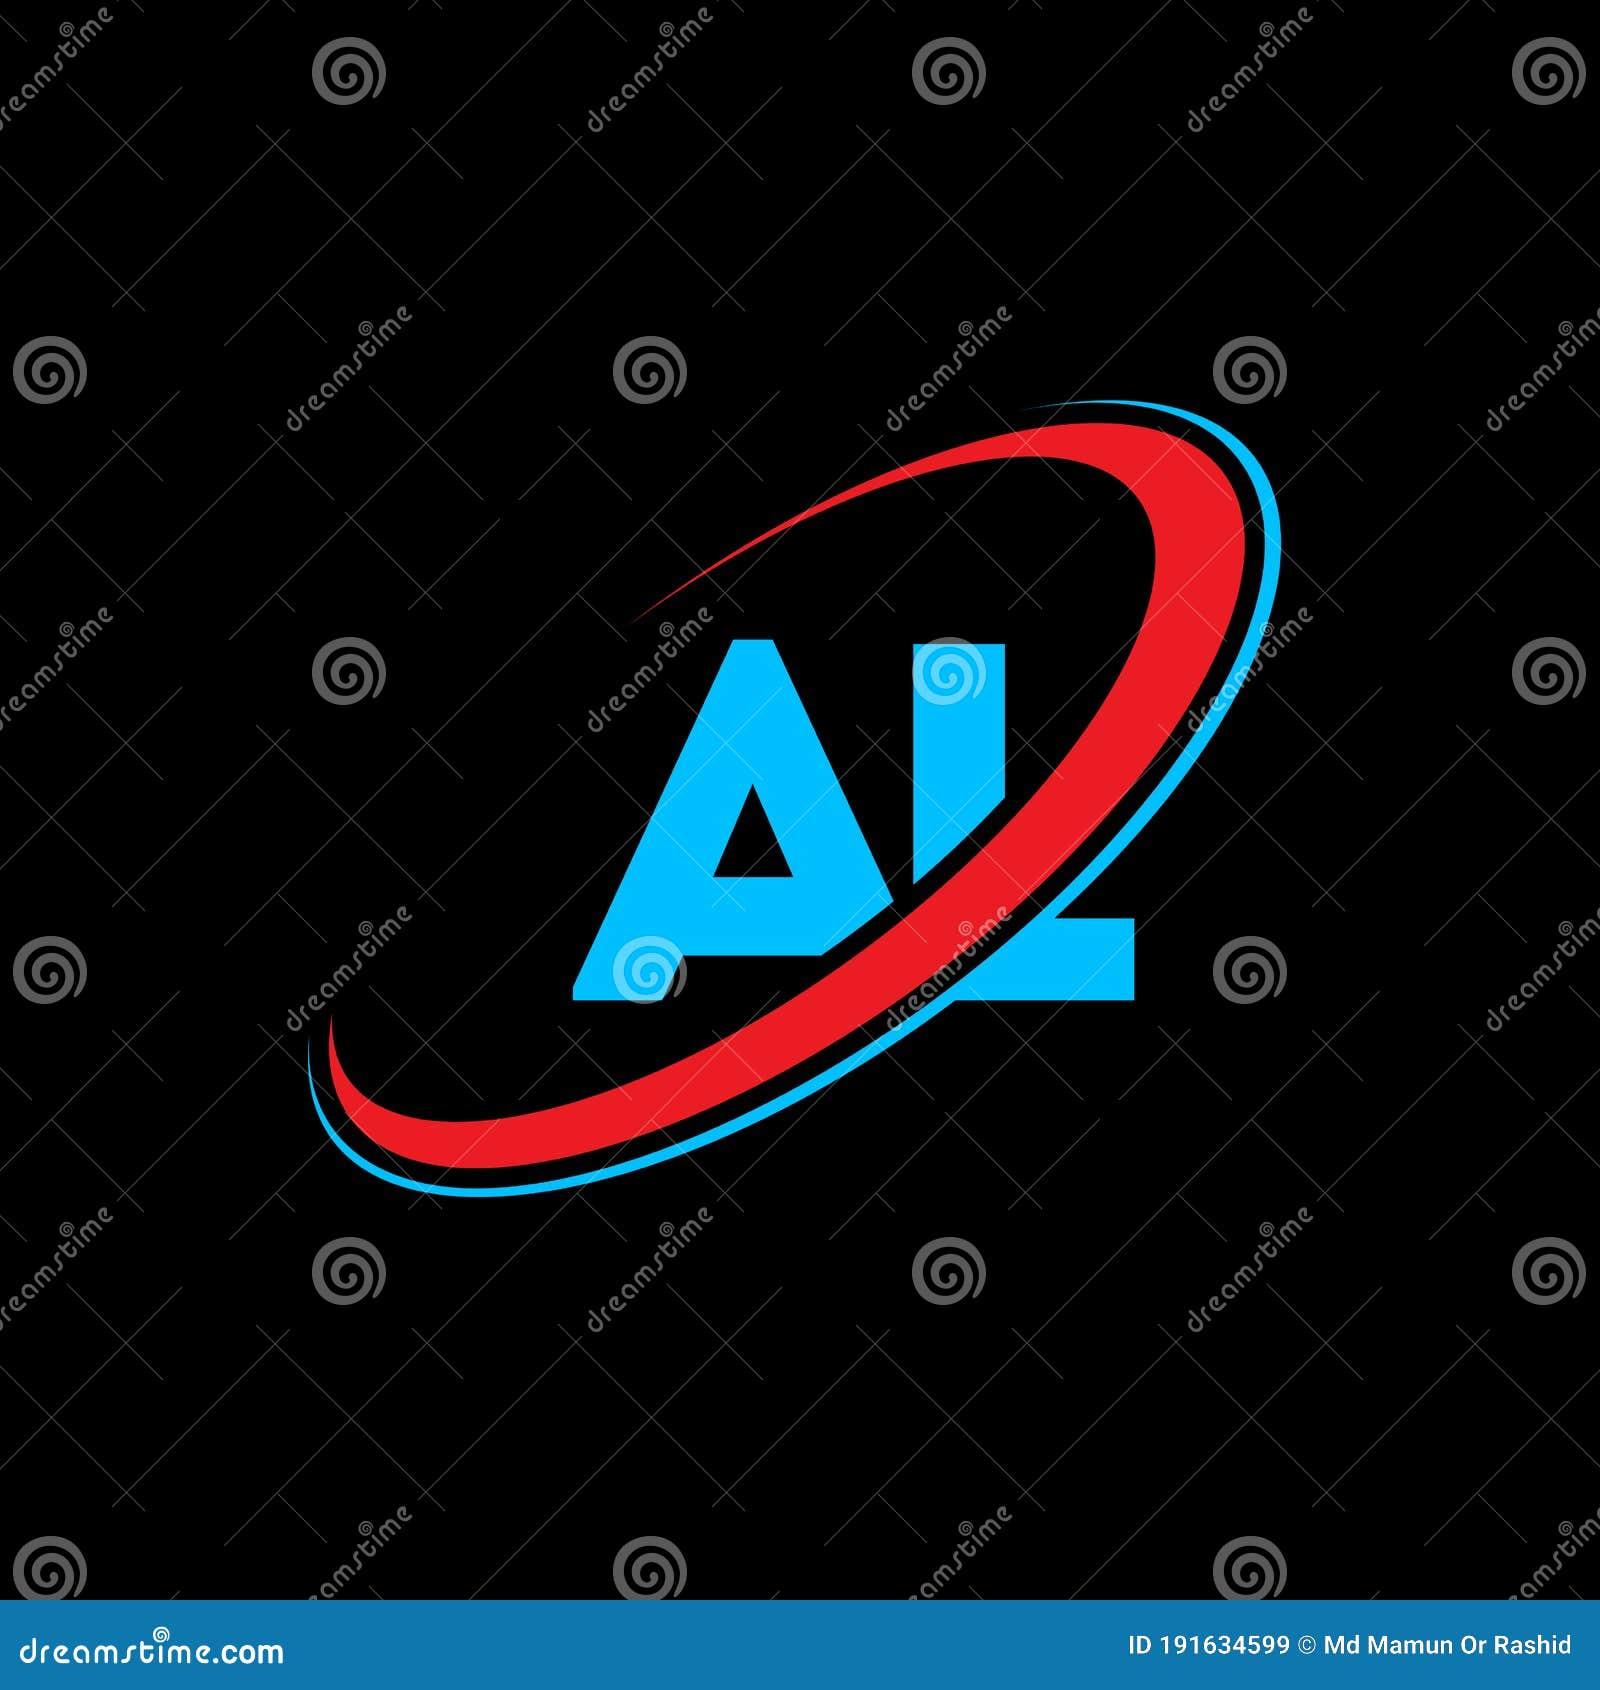 Al A L Letter Logo Design Initial Letter Al Linked Circle Uppercase Monogram Logo Red And Blue Al Logo A L Design Al A L Stock Vector Illustration Of Company Logo 191634599